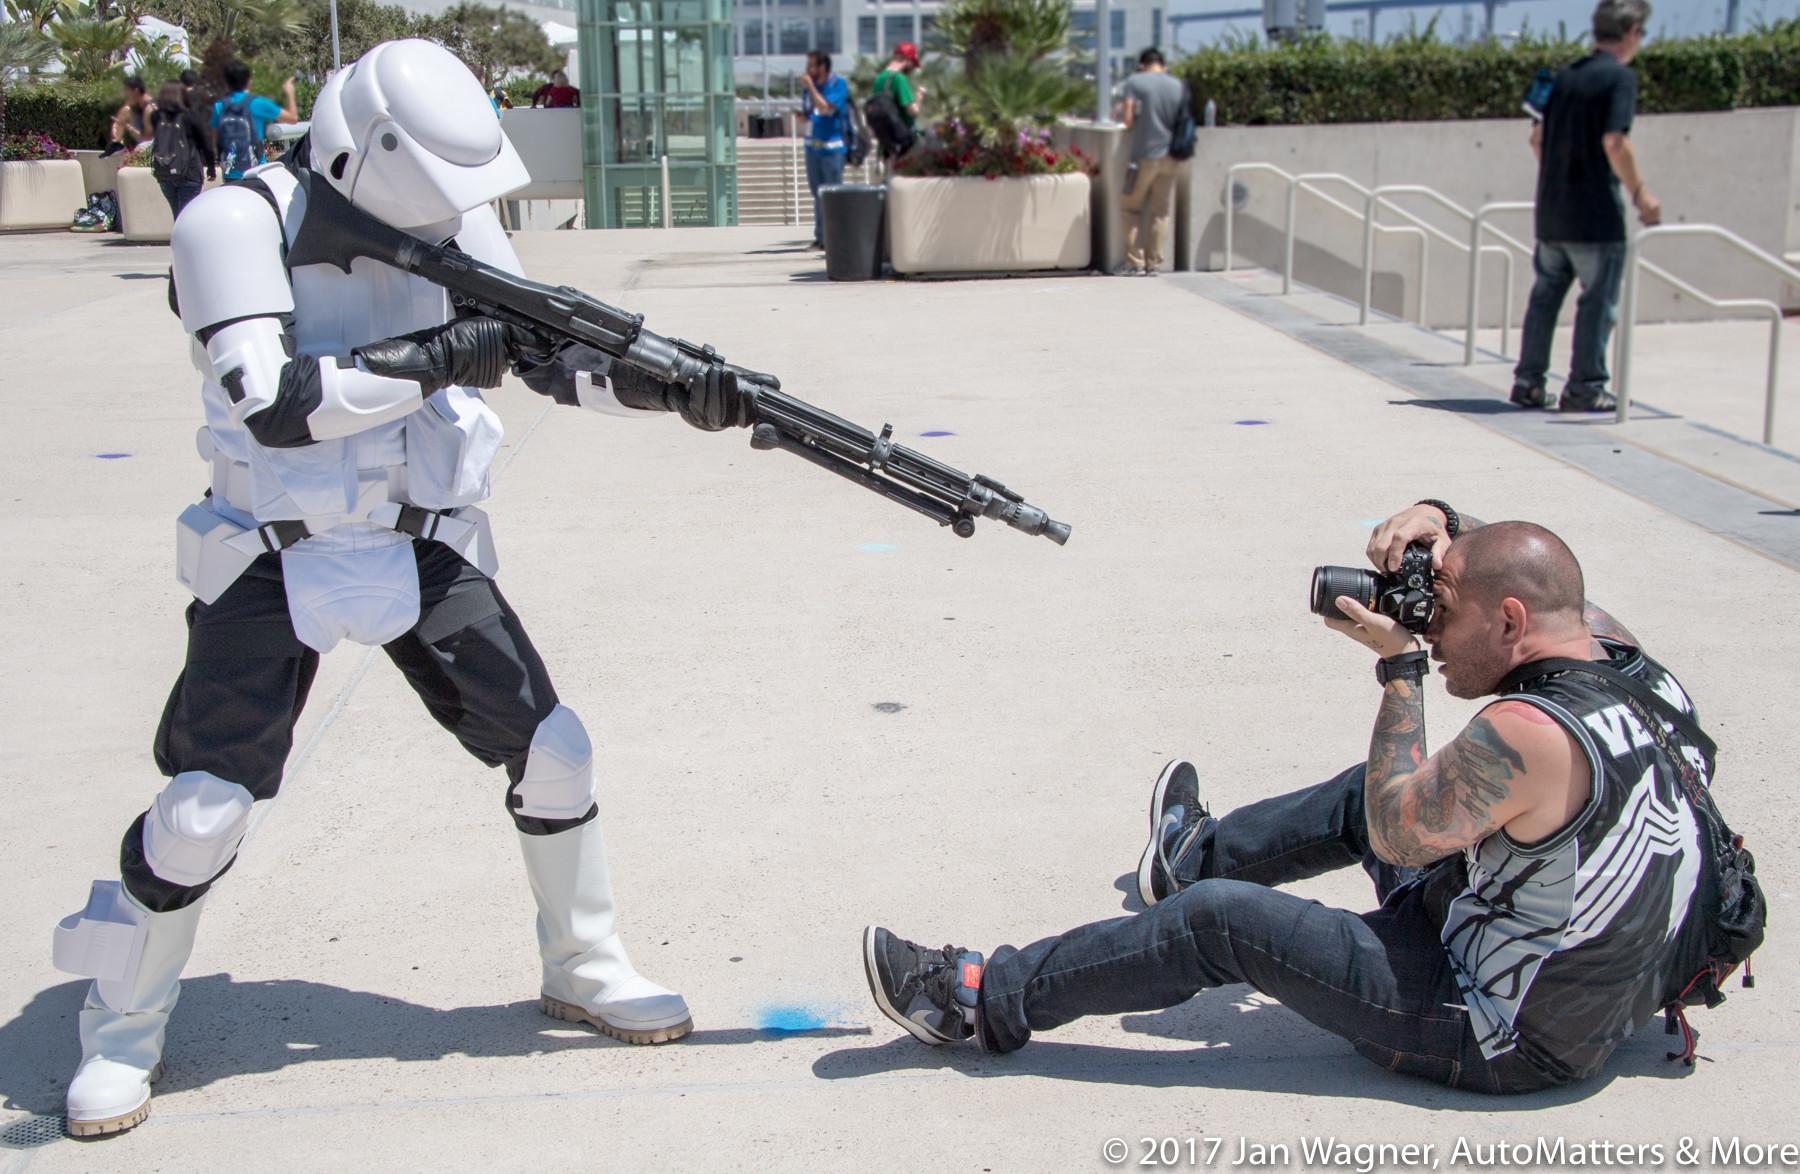 Shooting the shooter – San Diego Comic-Con 2016